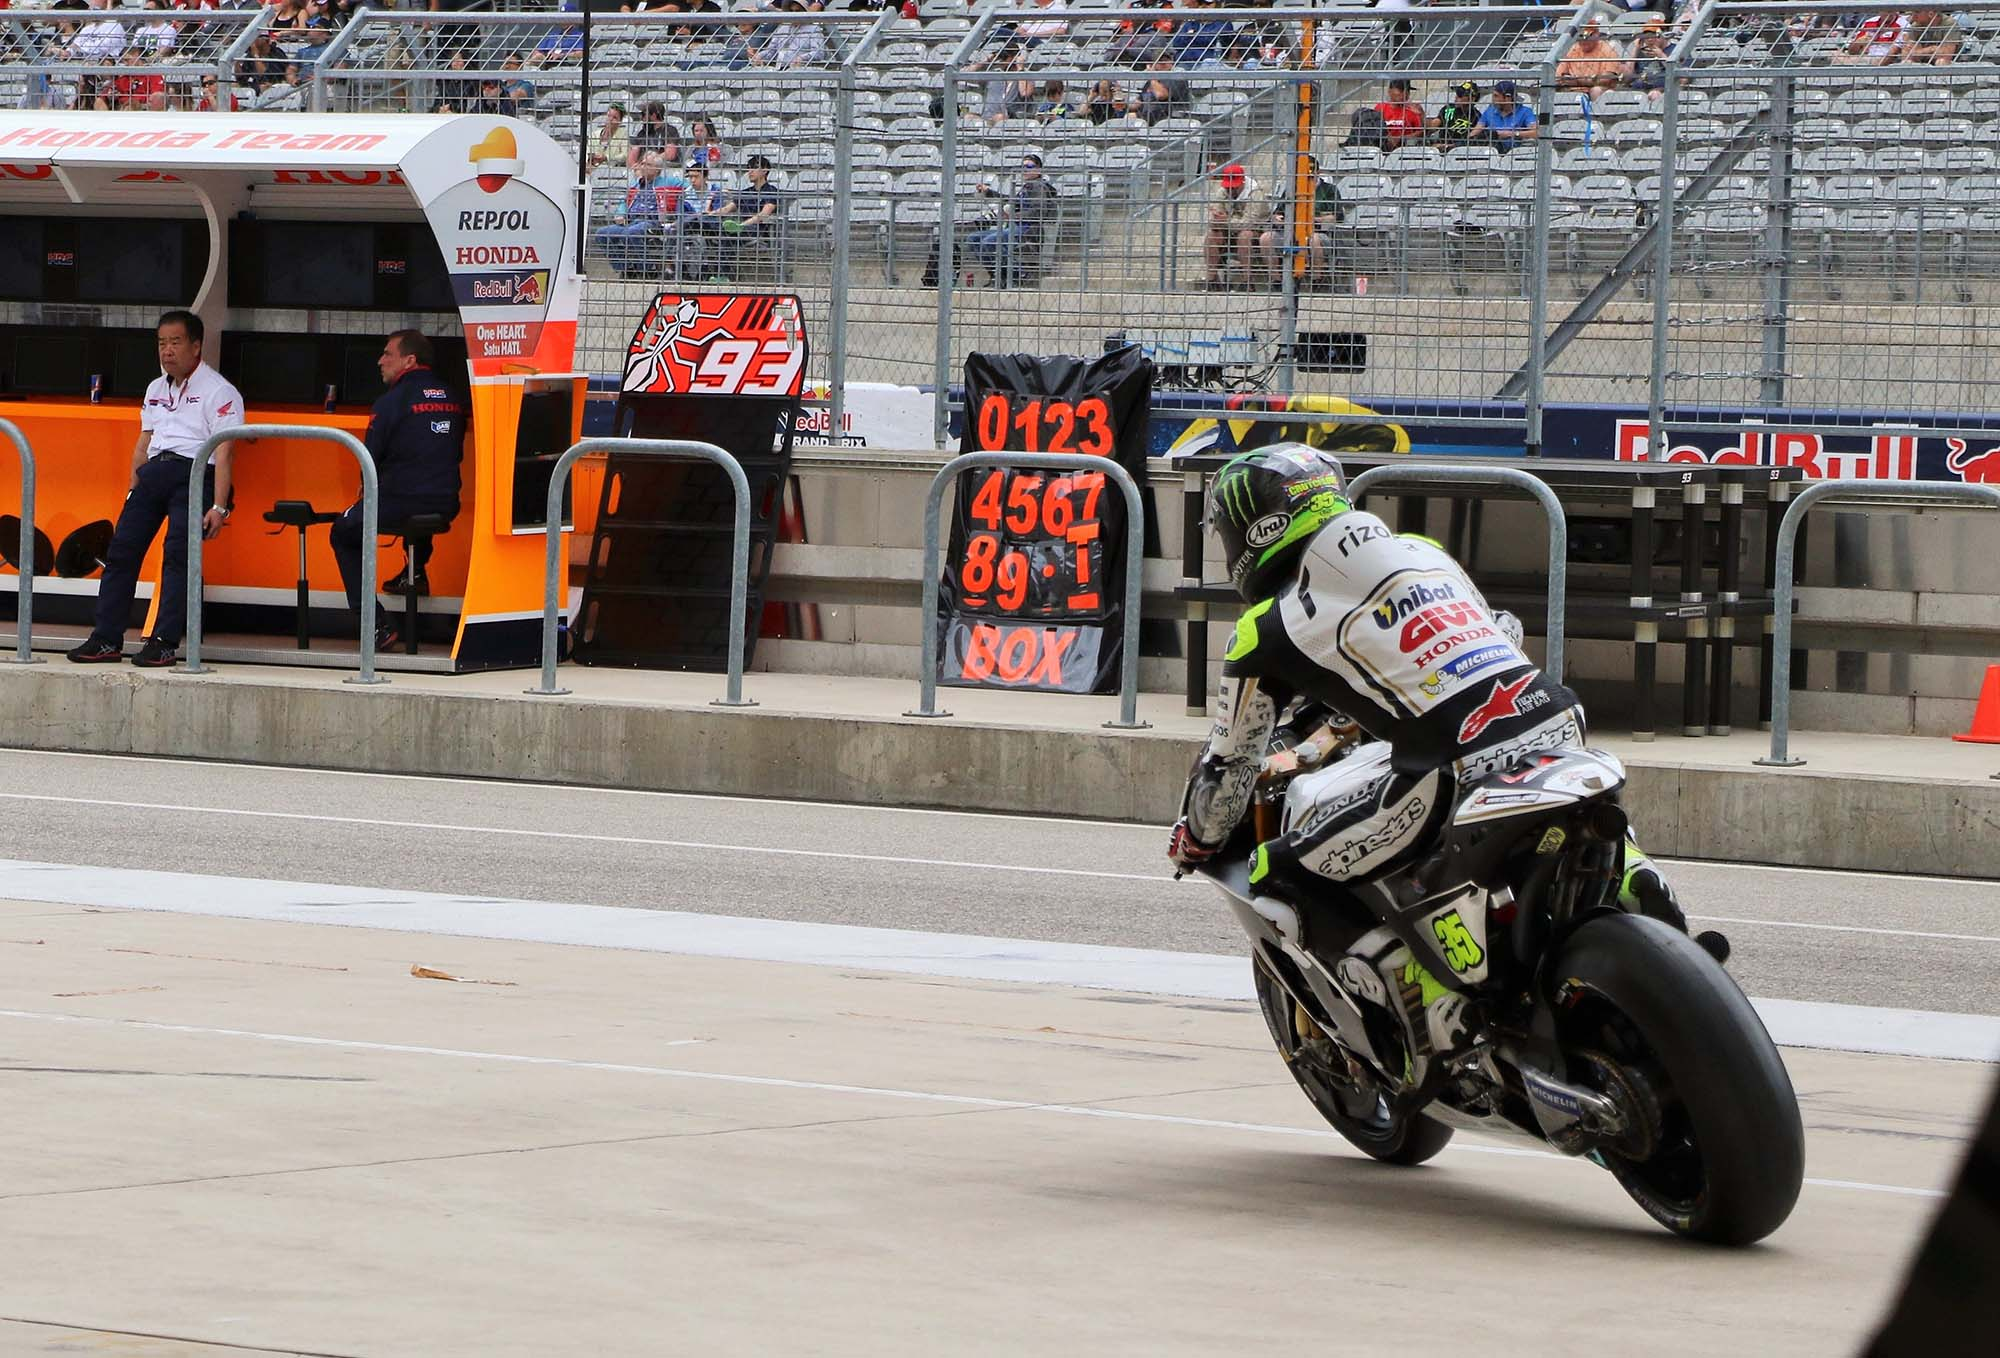 At MotoGP's Grand Prix of the Americas in Austin, Texas ...